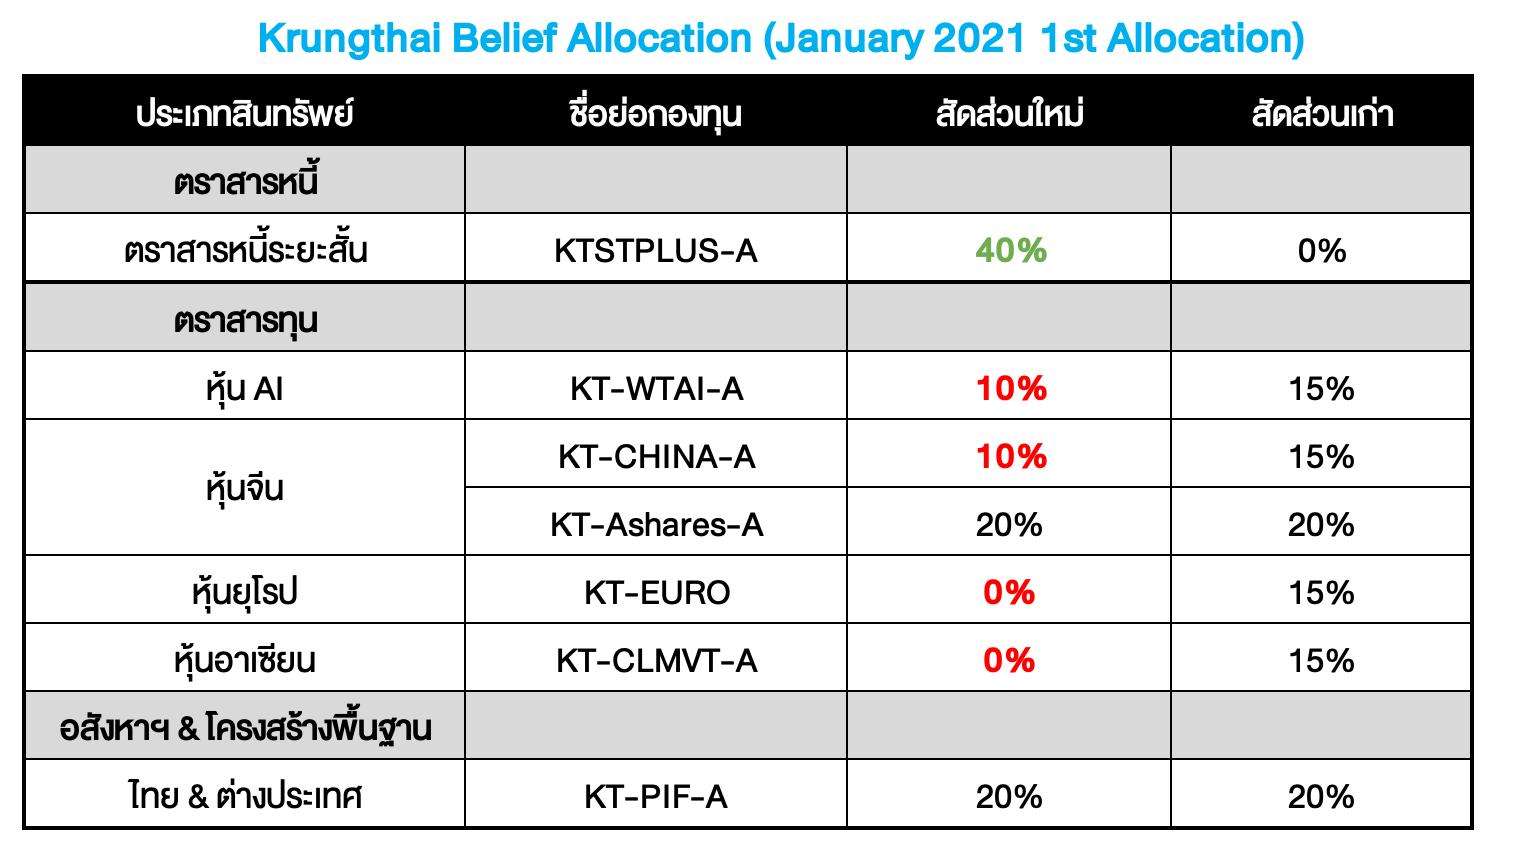 Krungthai Belief Allocation ปรับพอร์ตเดือน ม.ค. 2021 : Reload